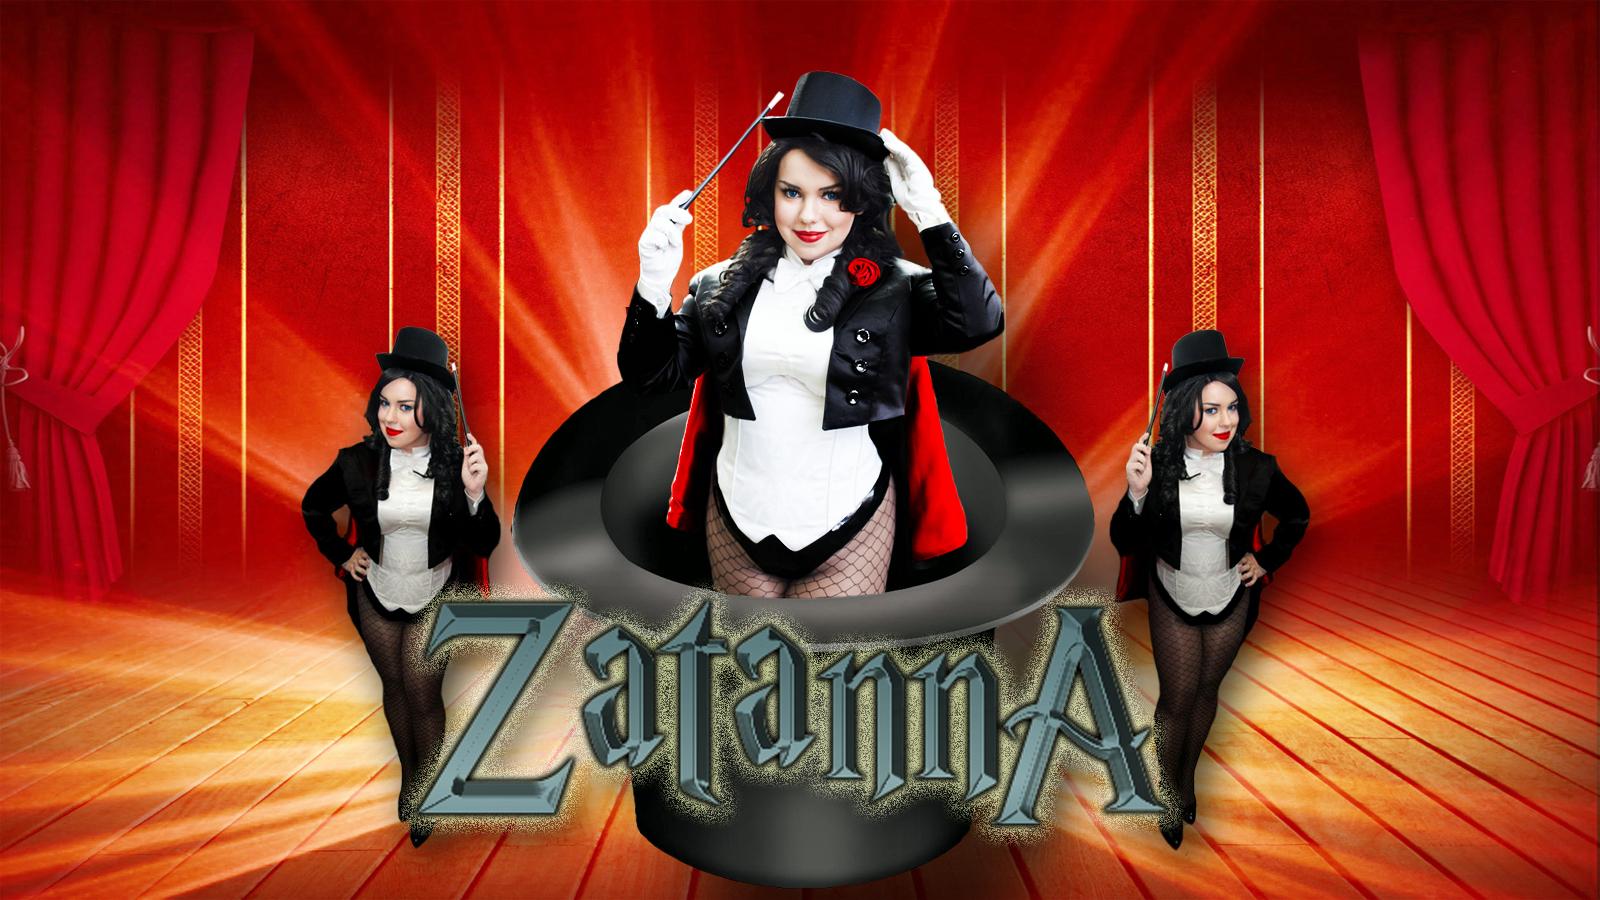 Zatanna cosplay wallpaper